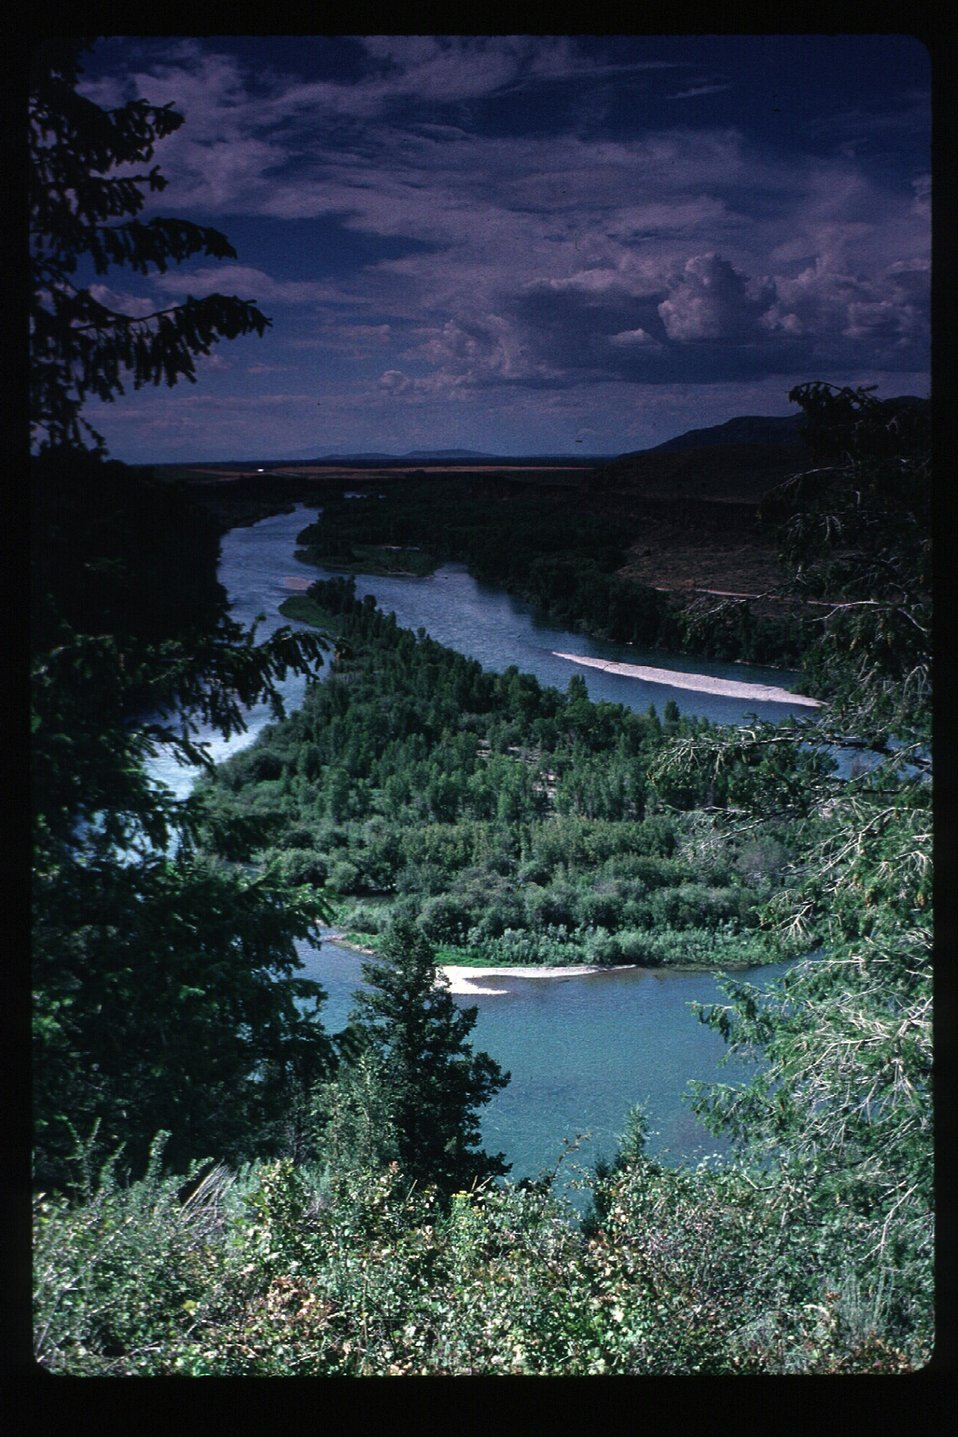 South Fork of Snake River  Scenic  Idaho Falls Field Office  USRD  Upper Snake River District